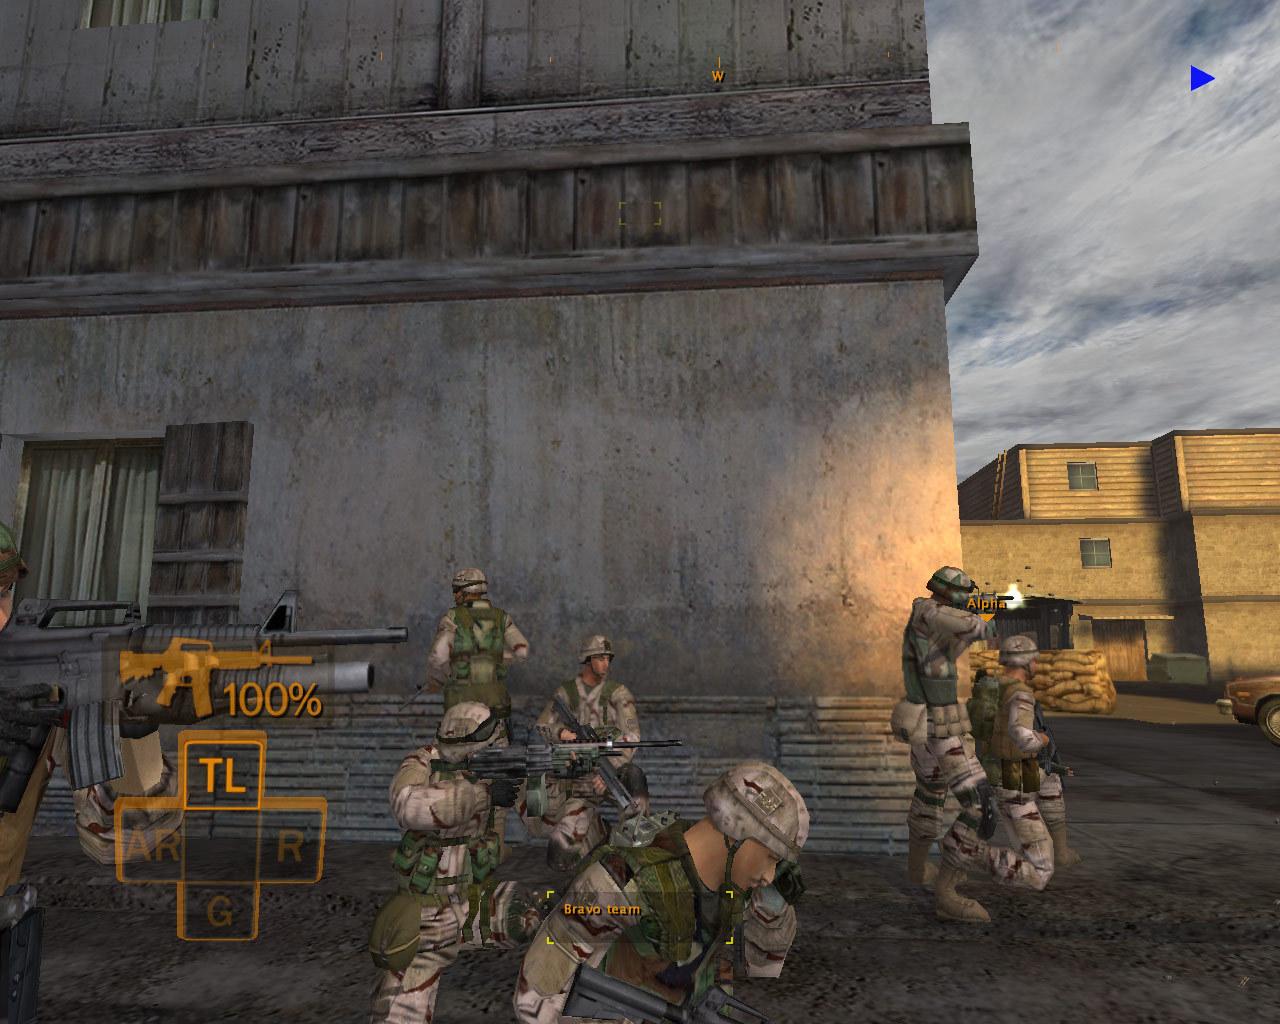 Full Spectrum Warrior screenshot 2